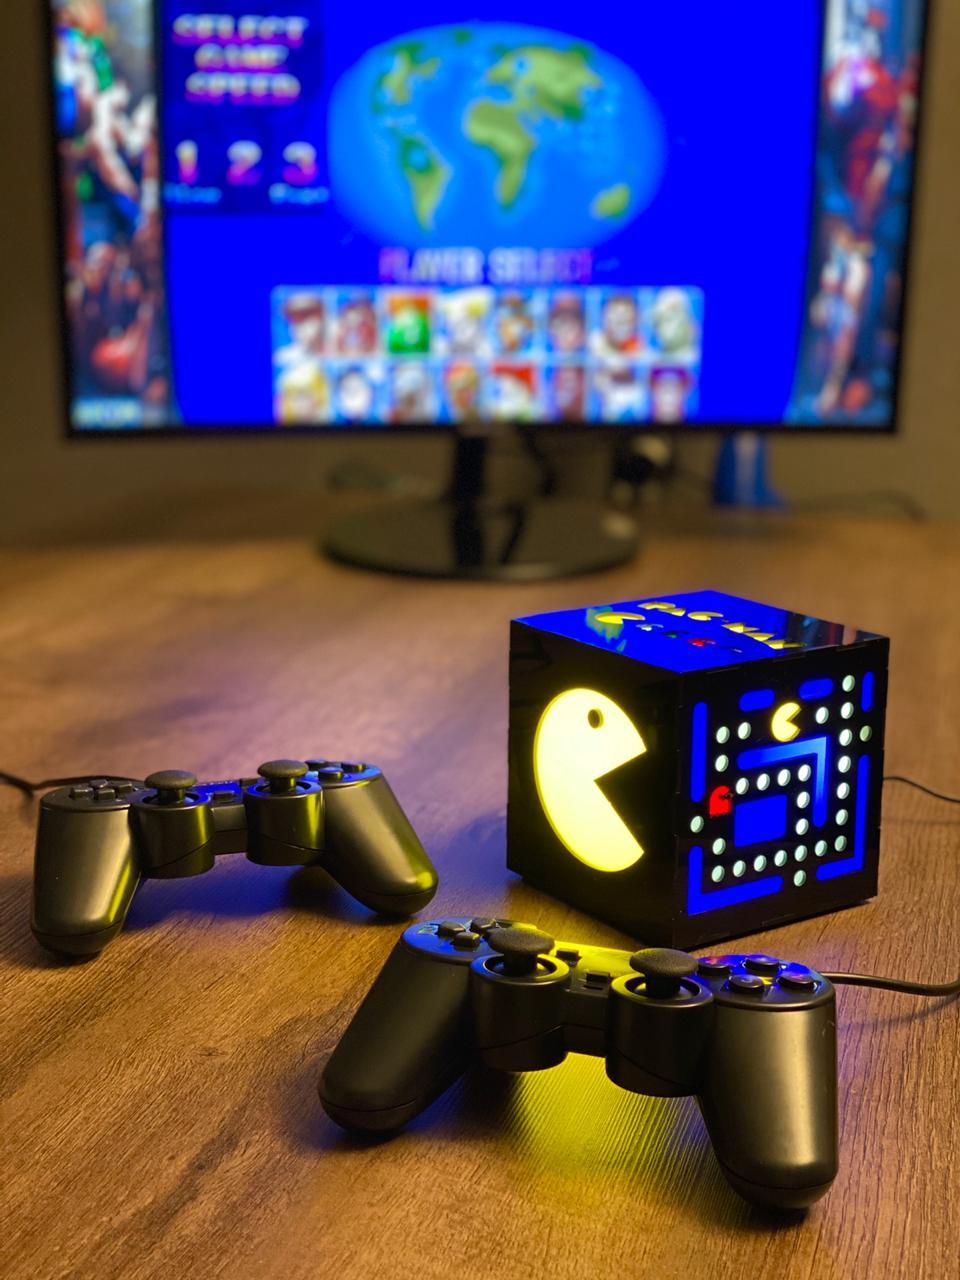 Cubo Retrô Box Pac-Man: Fliperama Arcade Game (20.000 Jogos) PlayStations/Nintendo/Super Nintendo/Mega Drive/Sega Saturn